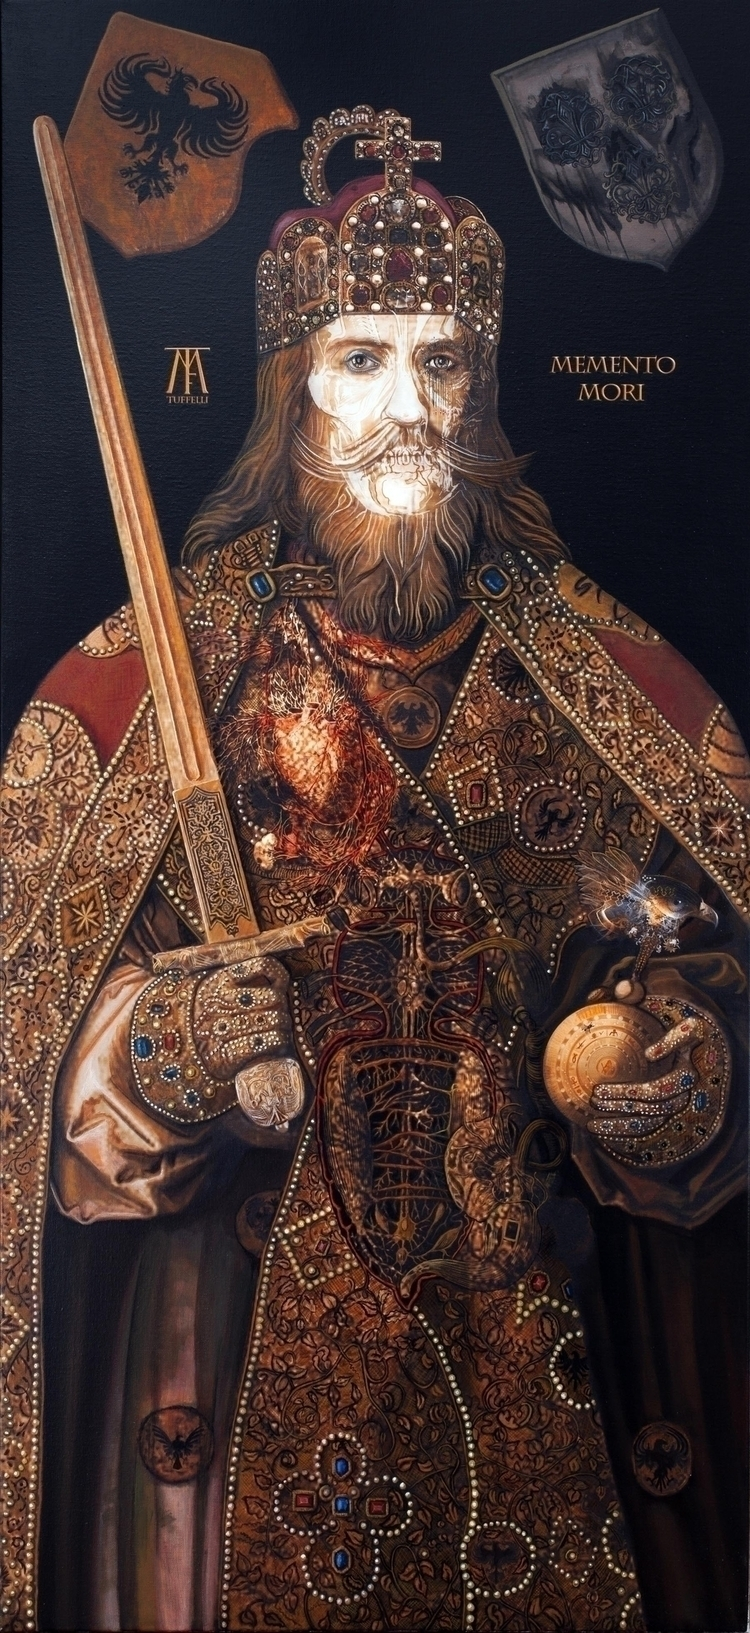 Charlemagne Acrylique sur toile - tuffelli | ello